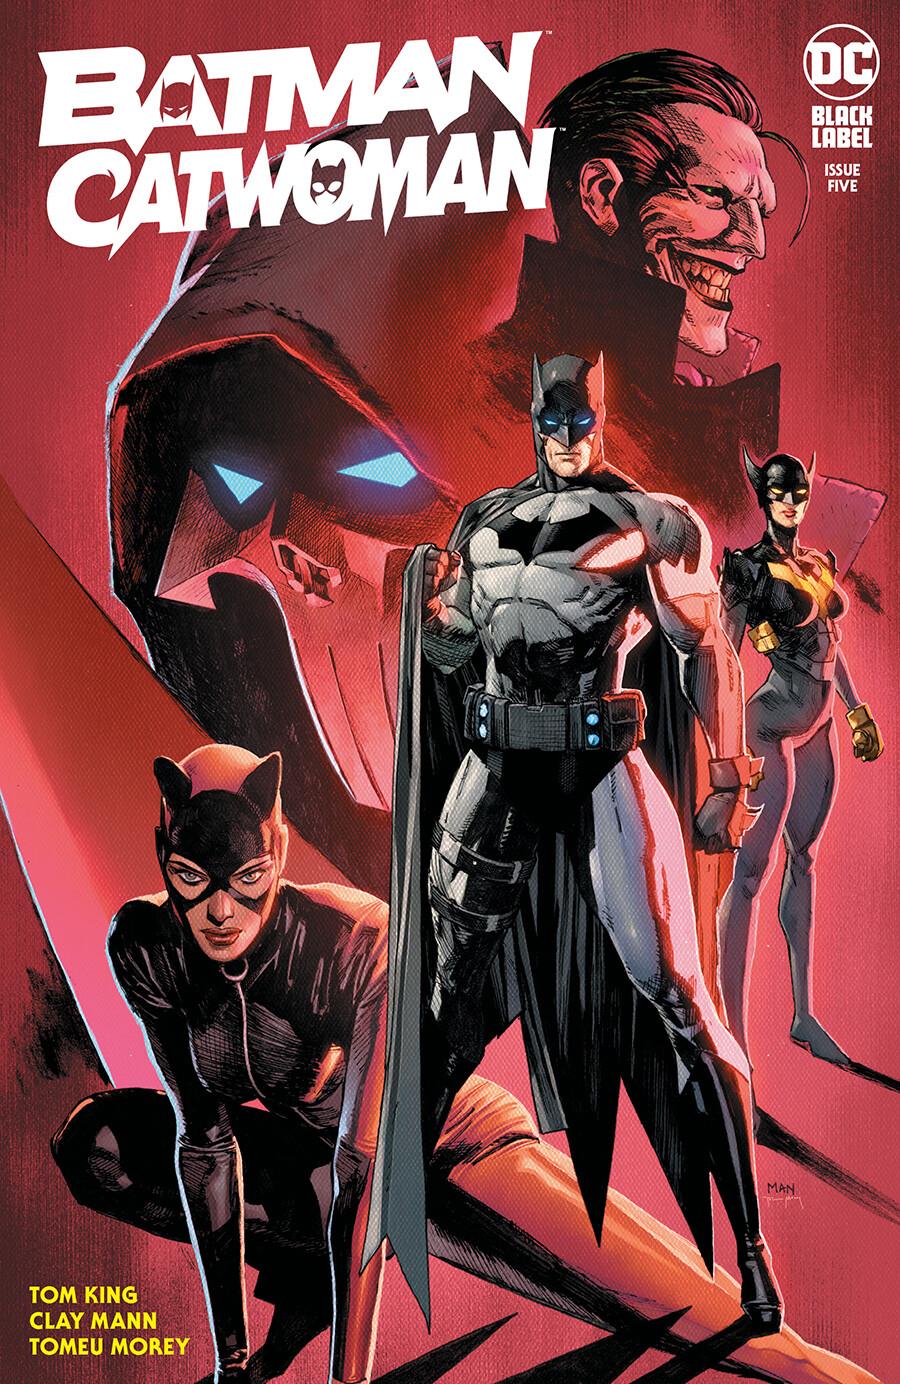 batman-catwoman-5-of-12-cvr-a-clay-mann-mr